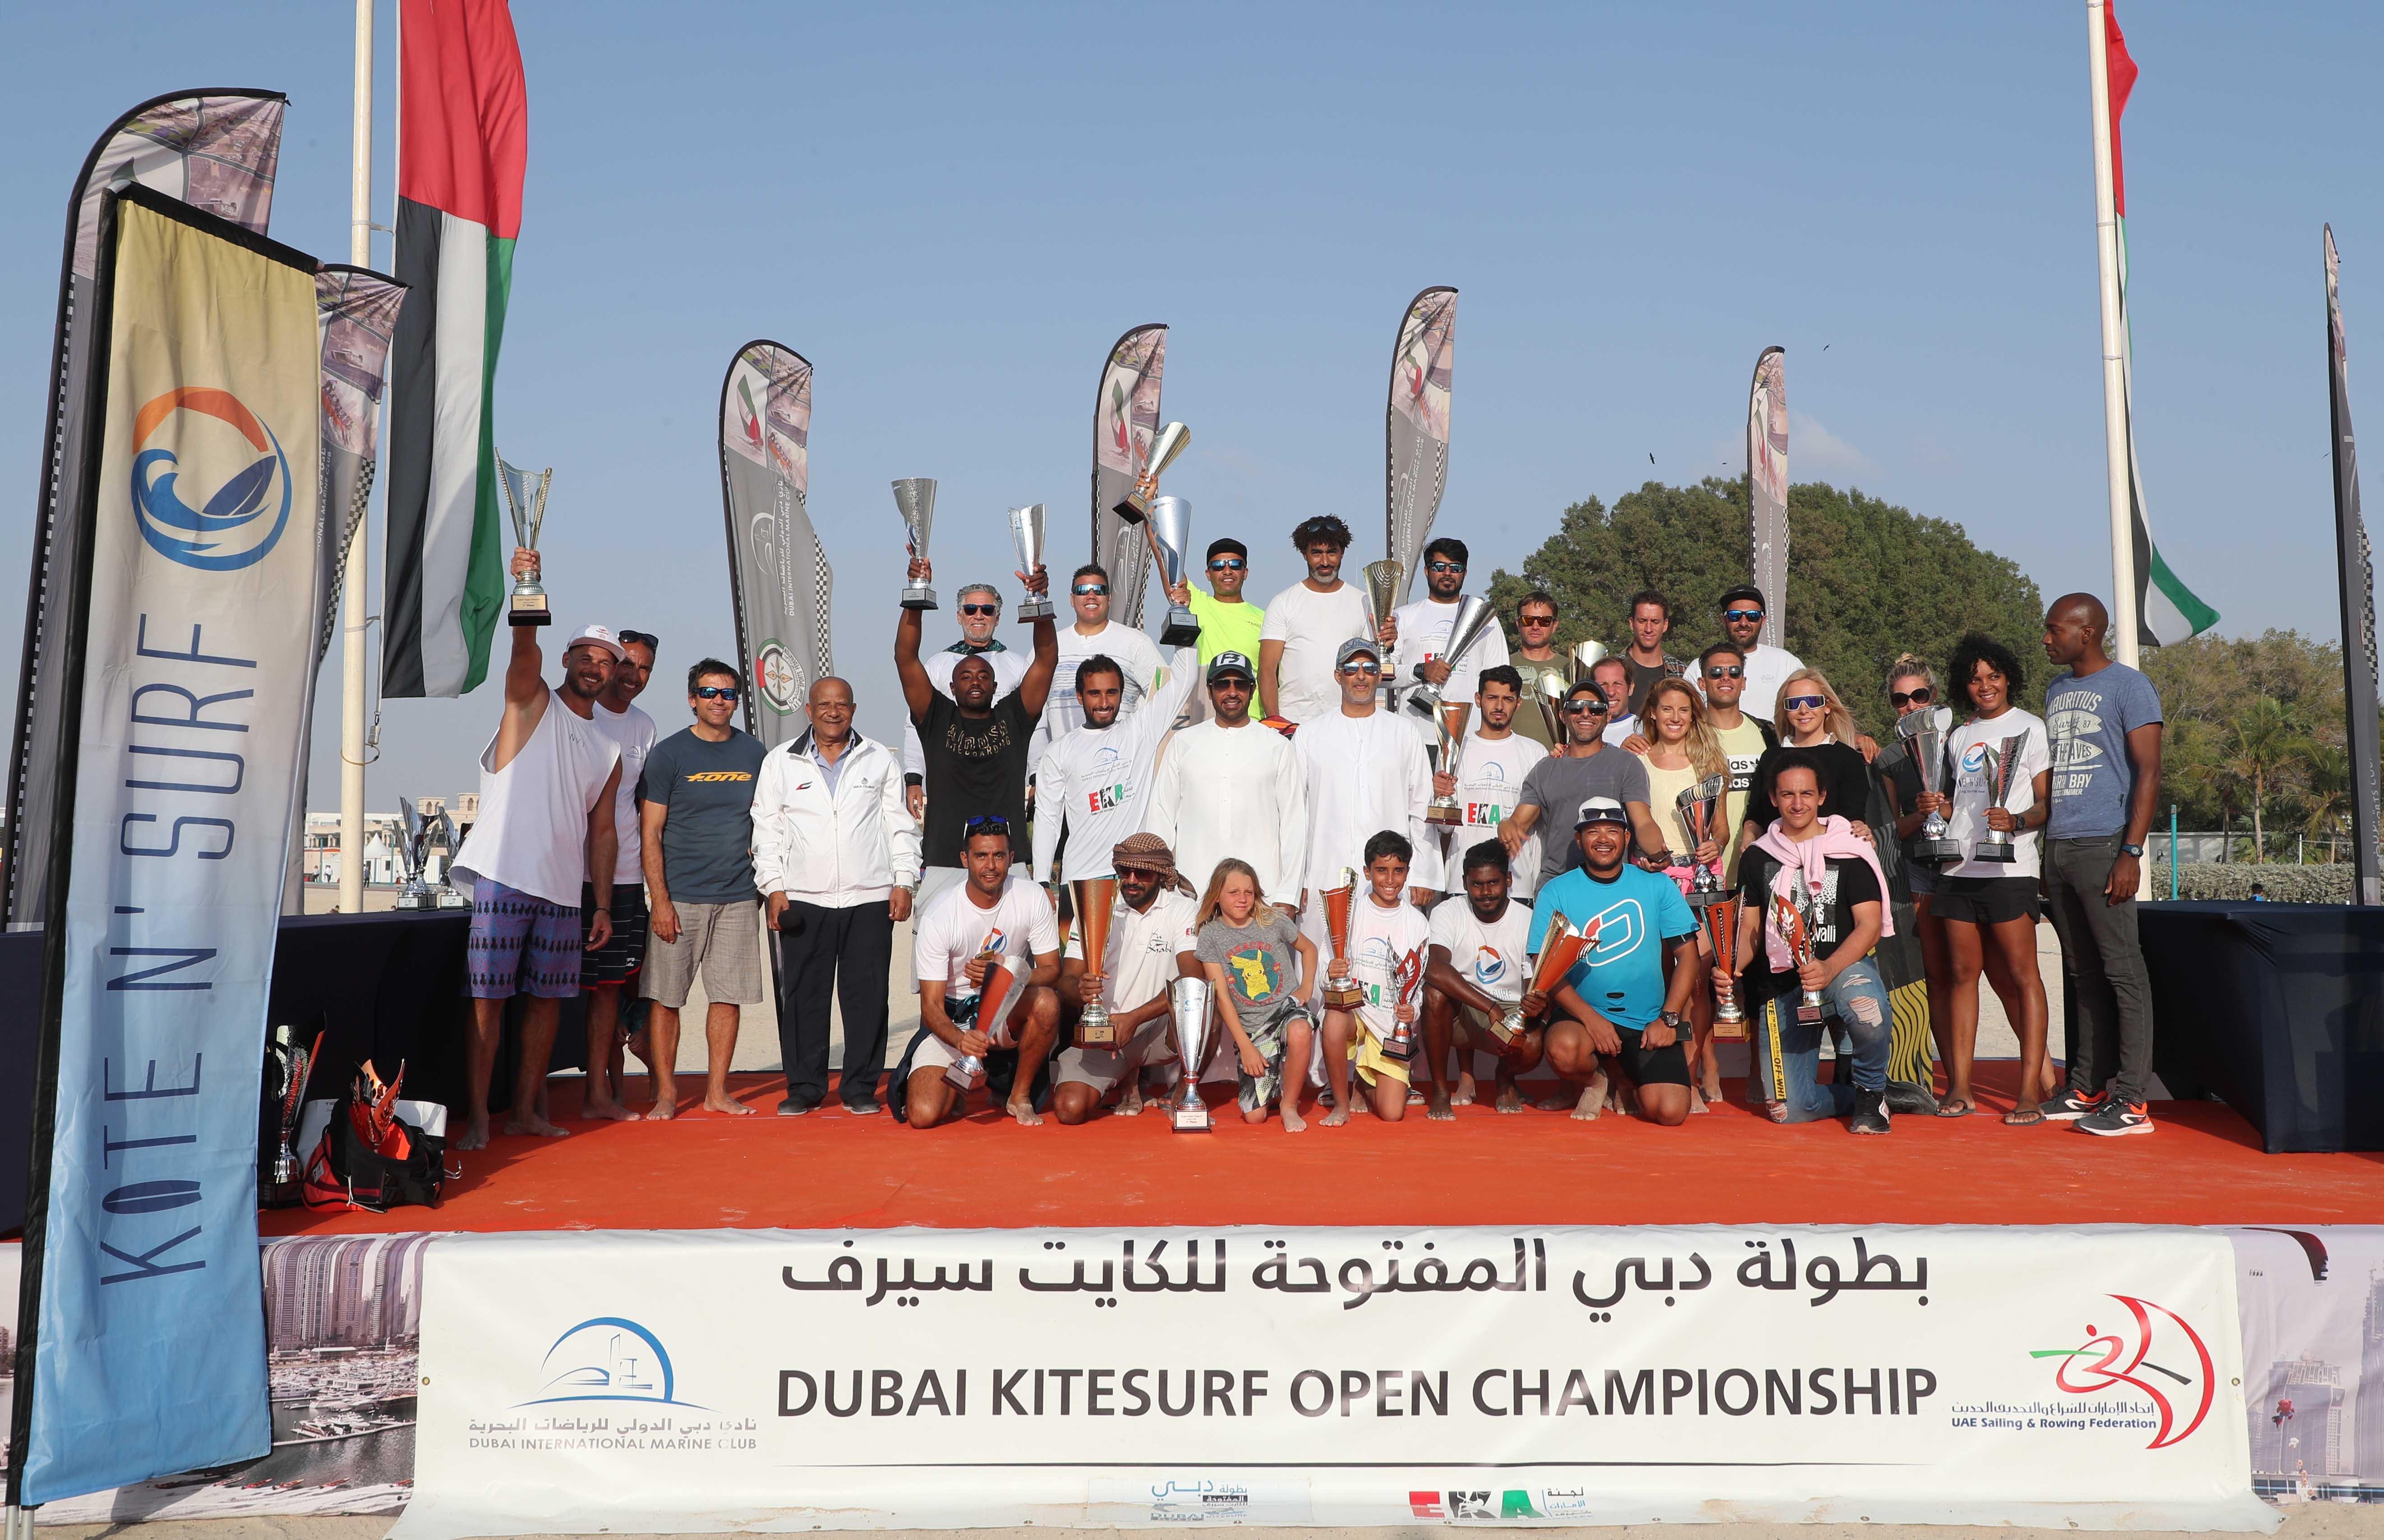 UAE Kitesurfer Stars catch the attention of the Public in Kite Beach